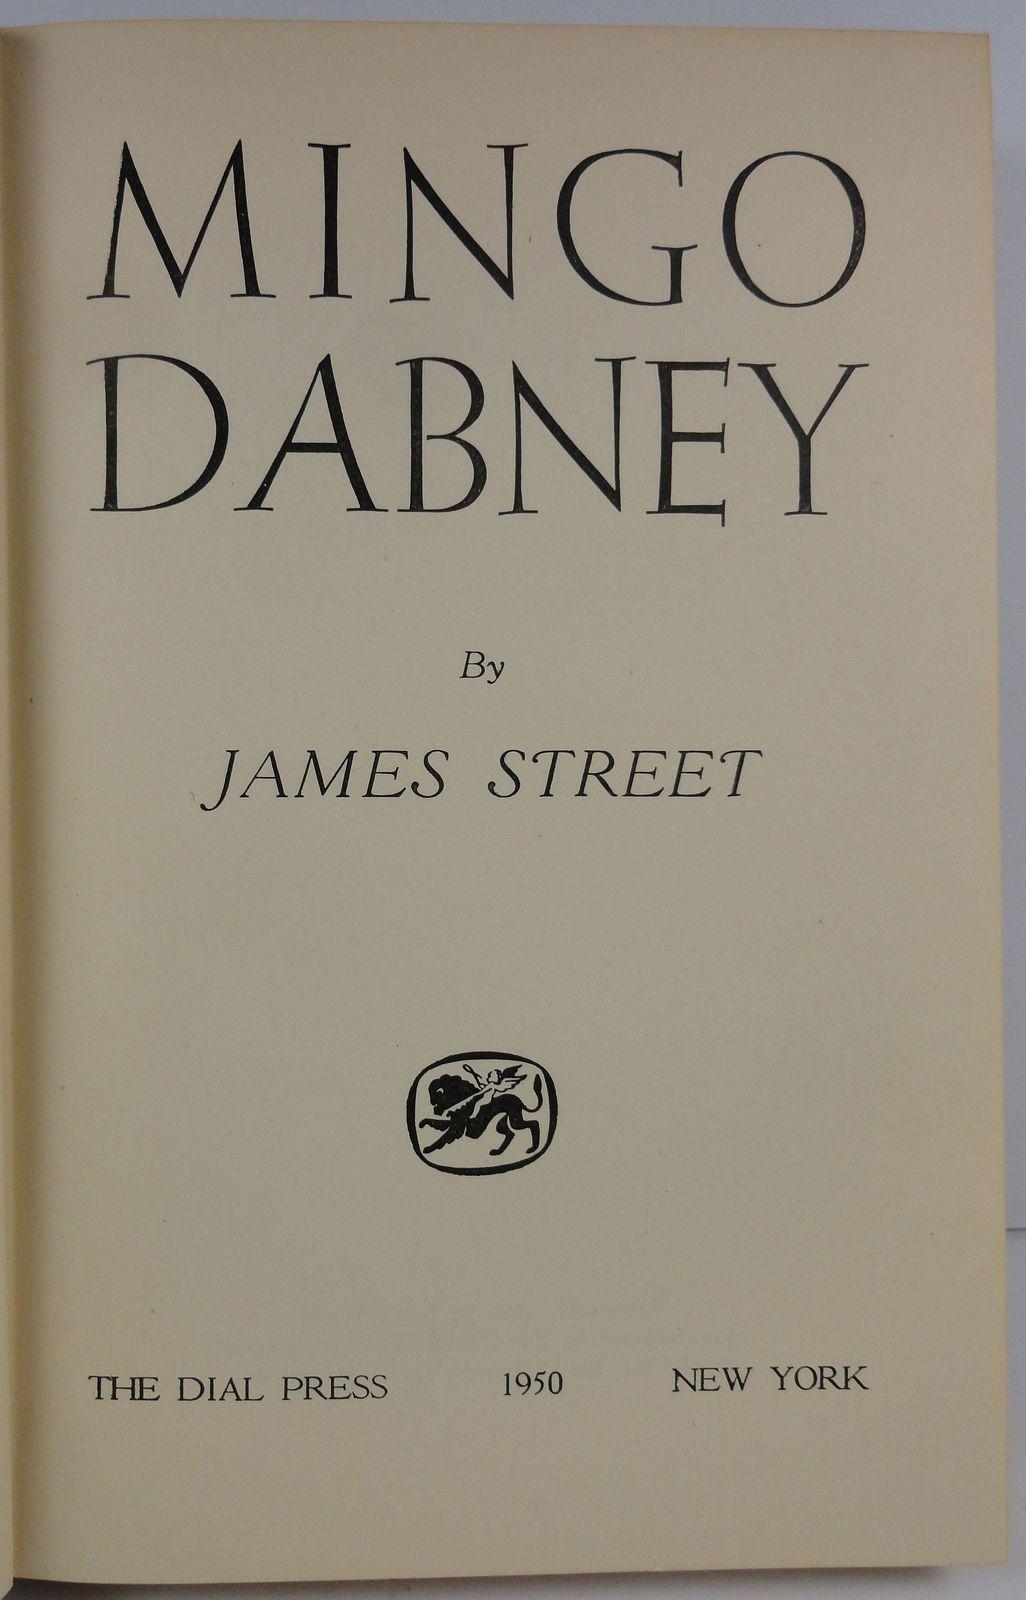 Mingo Dabney by James Street 1950 The Dial Press